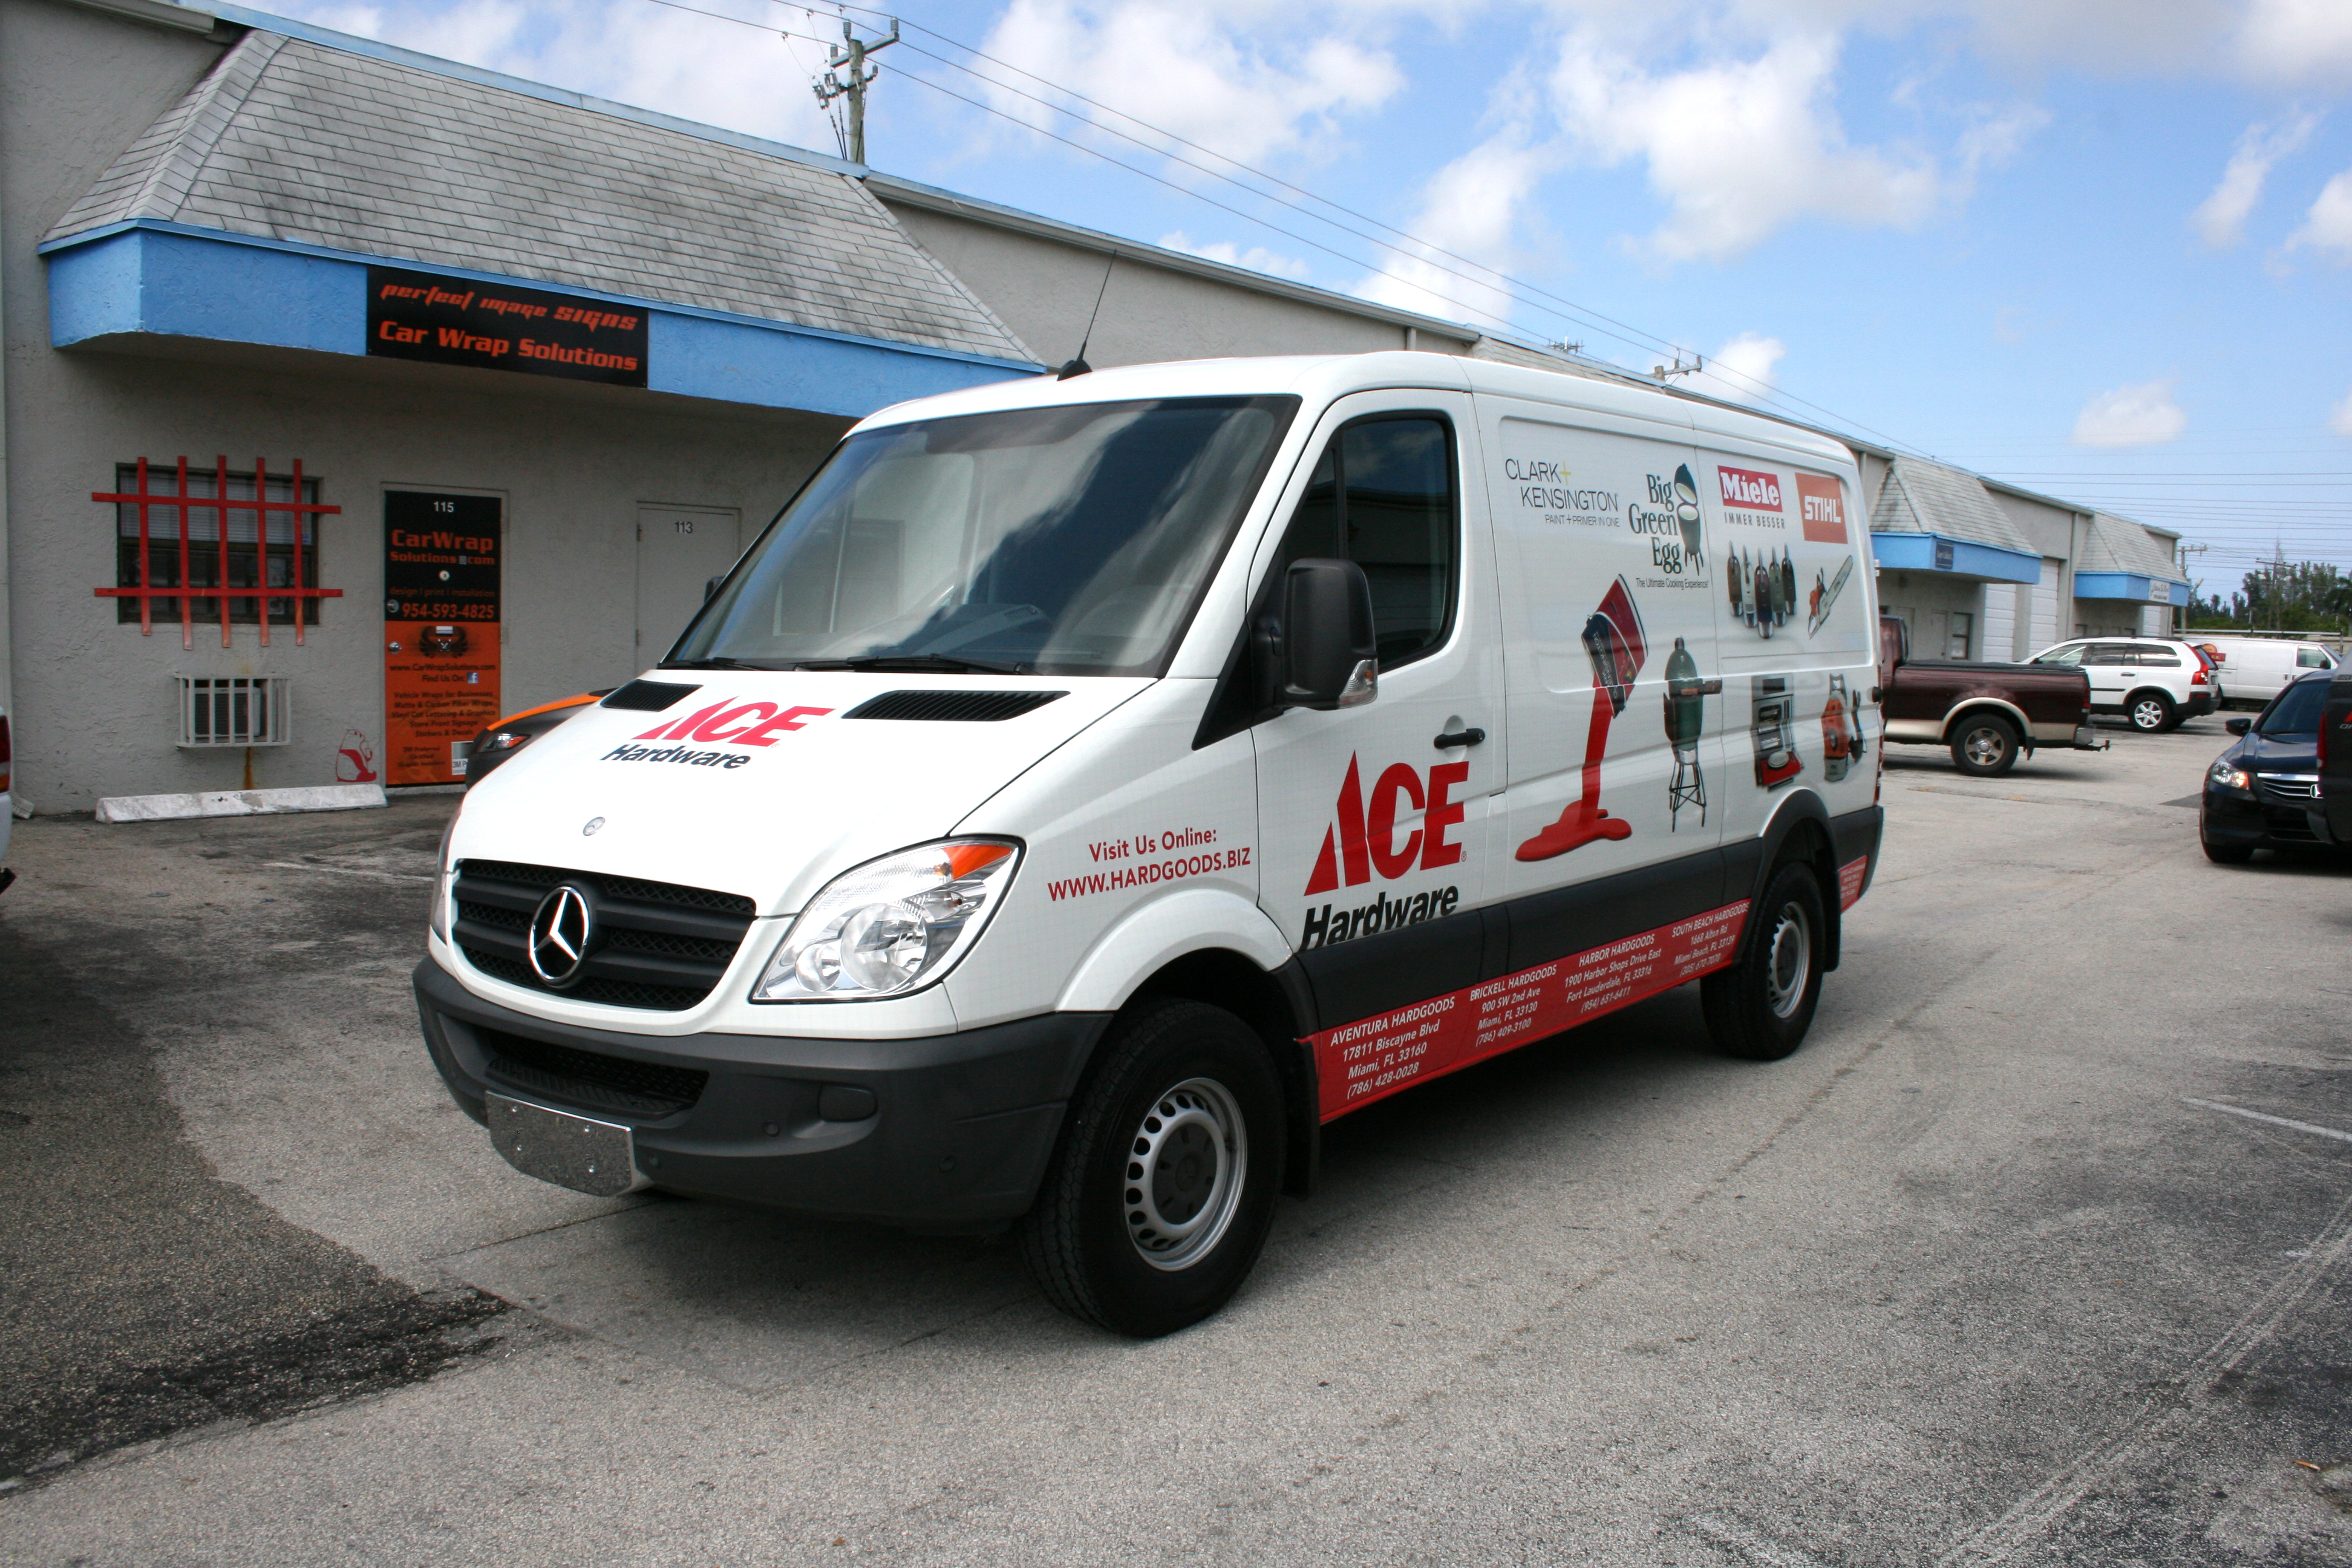 Mercedes Sprinter Work Van >> Sprinter Van Wrap Fort Lauderdale Florida Ace Hardware Hardgoods